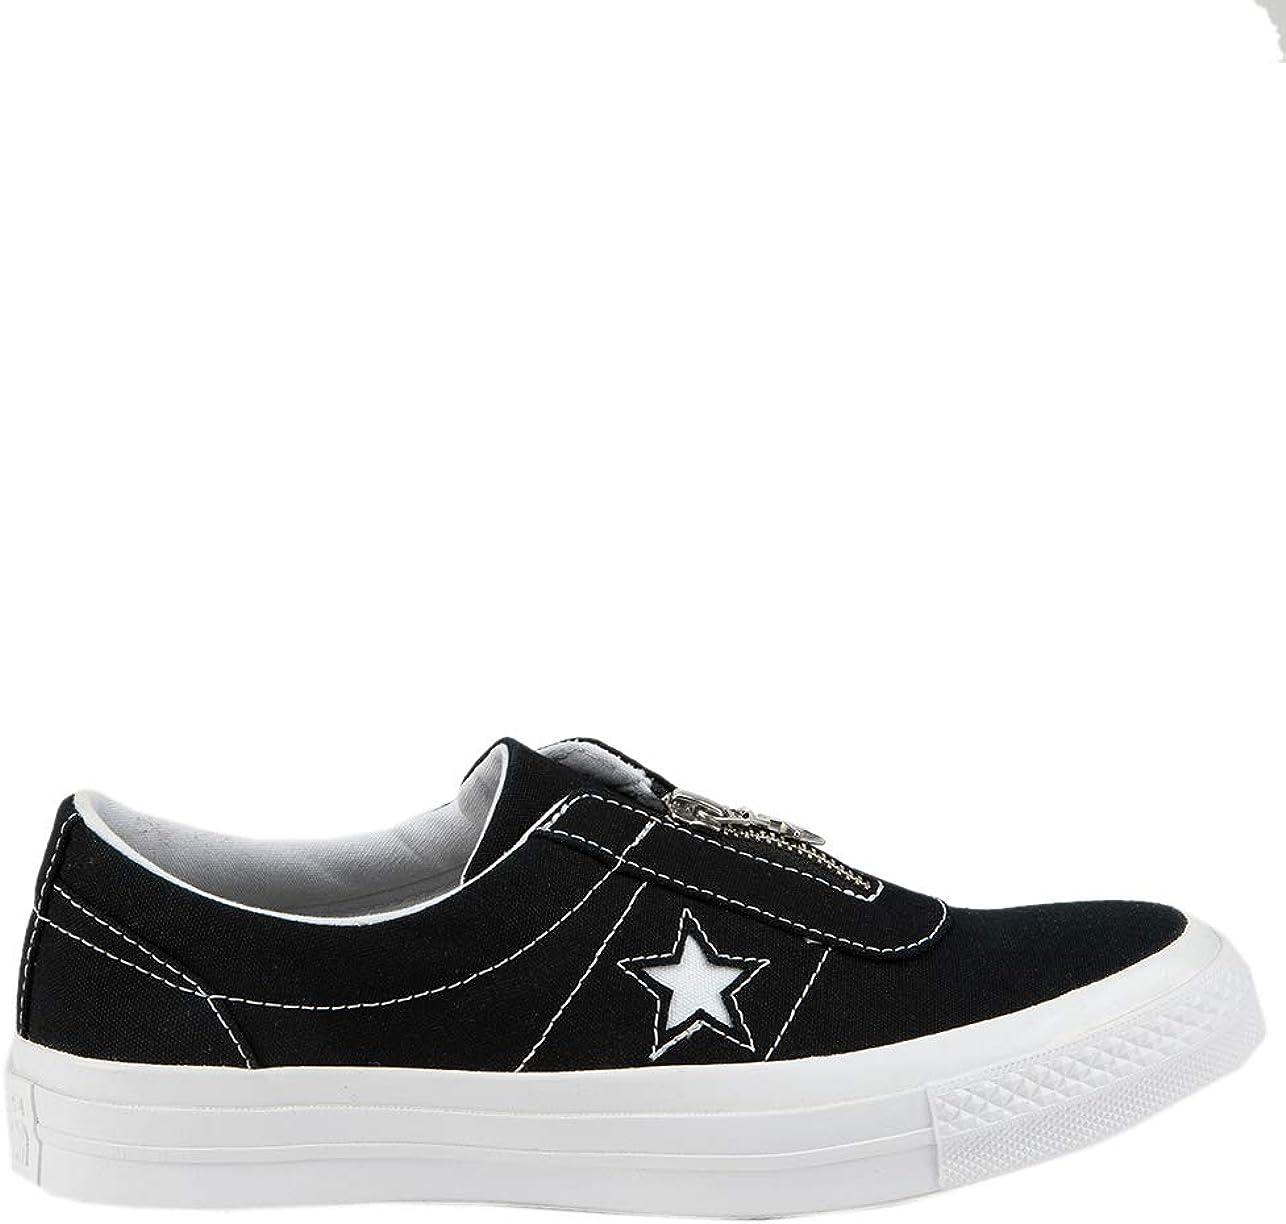 converse one star slip